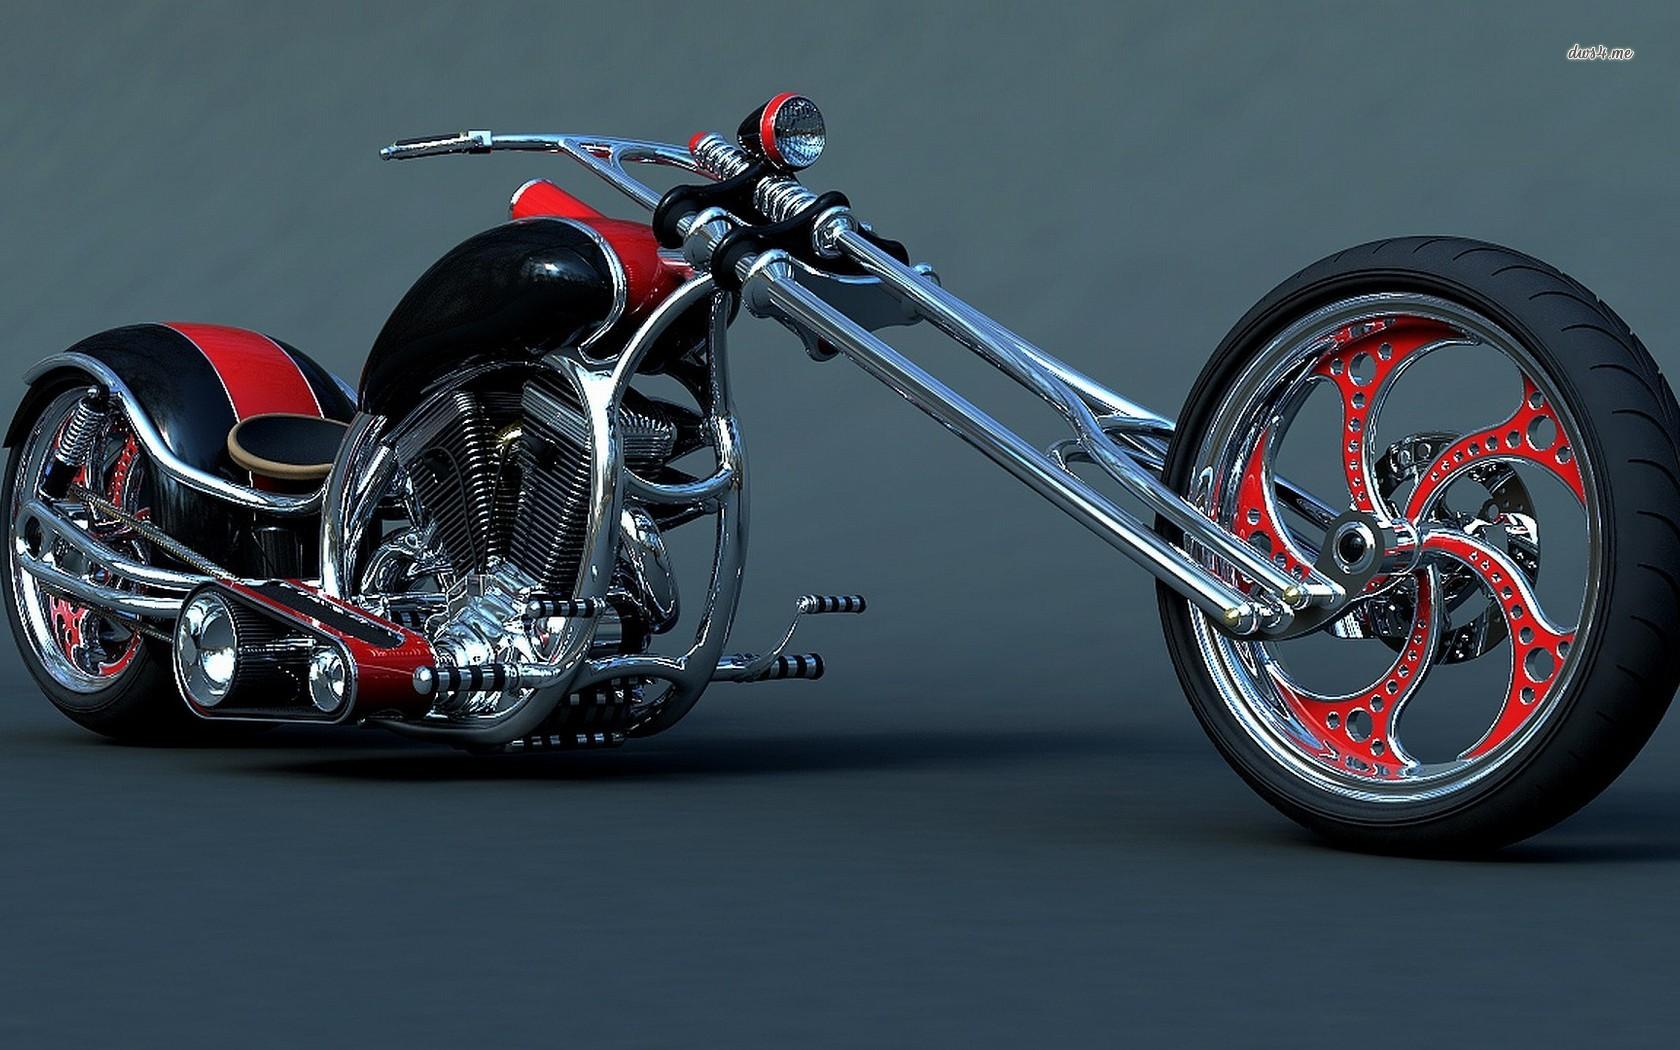 Harley Davidson Motorcycles Custom Harley Davidson chopper wallpaper 1680x1050